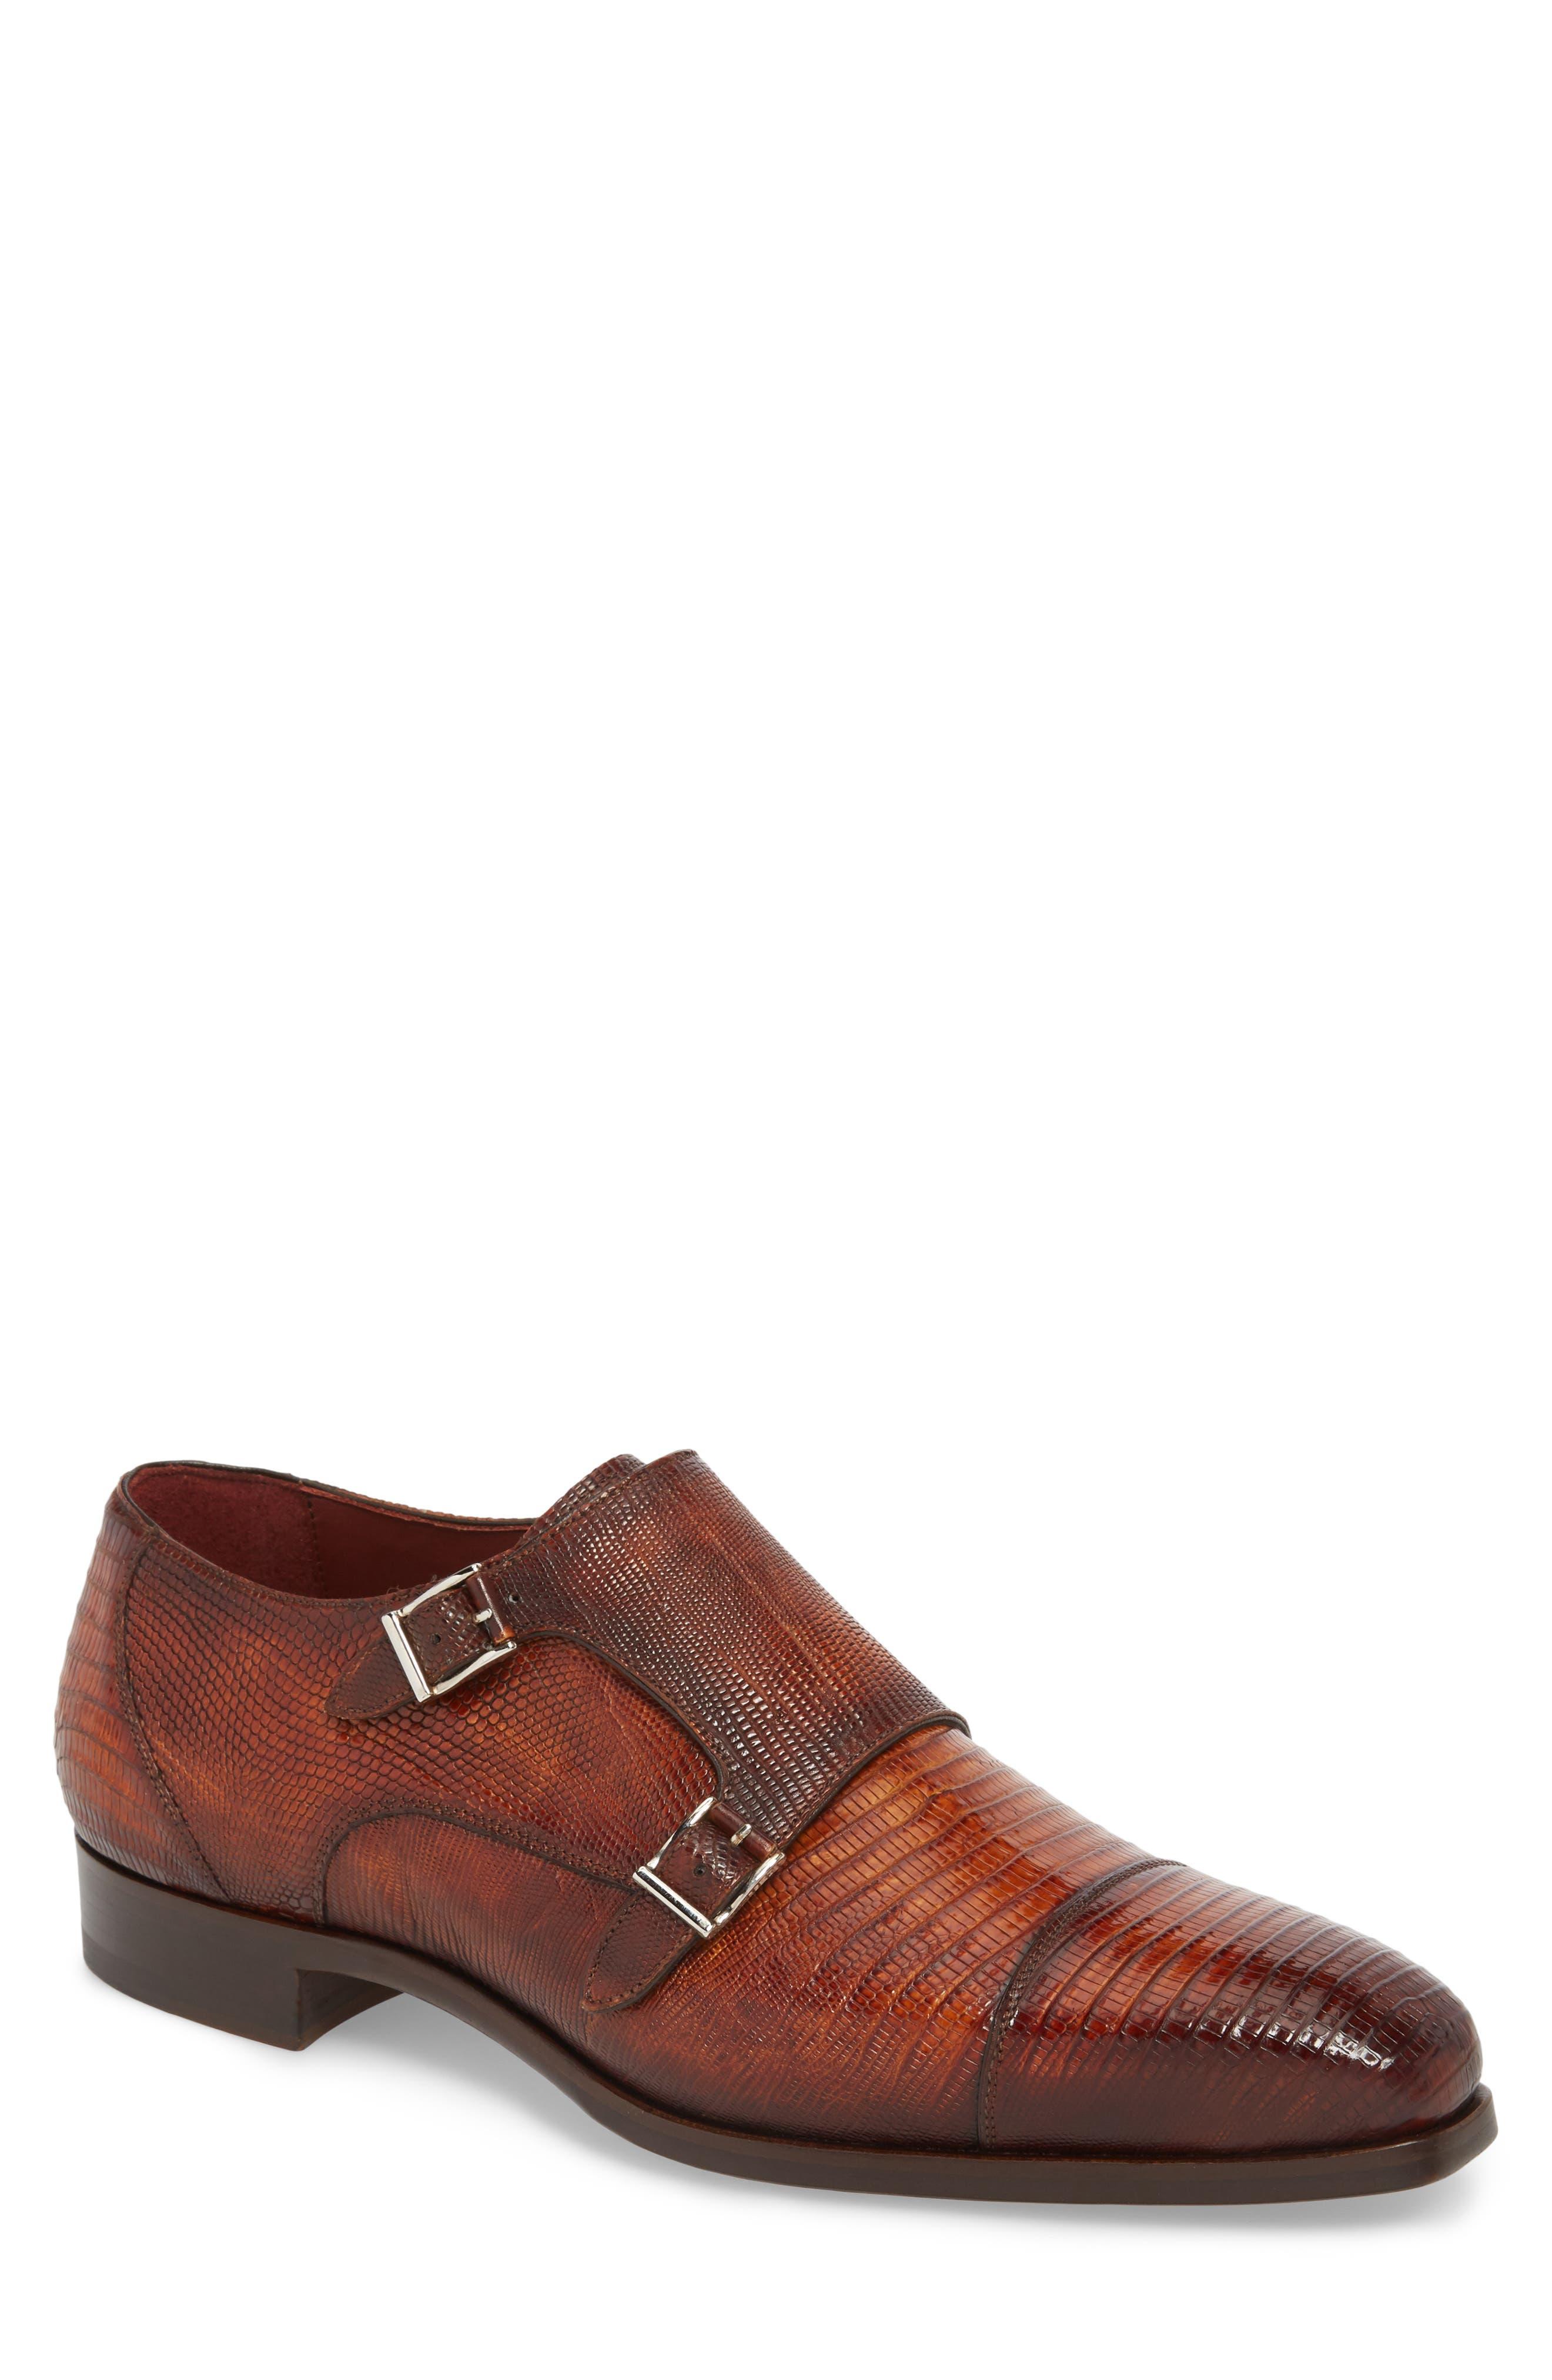 Isaac Cap Toe Monk Shoe,                         Main,                         color, 219